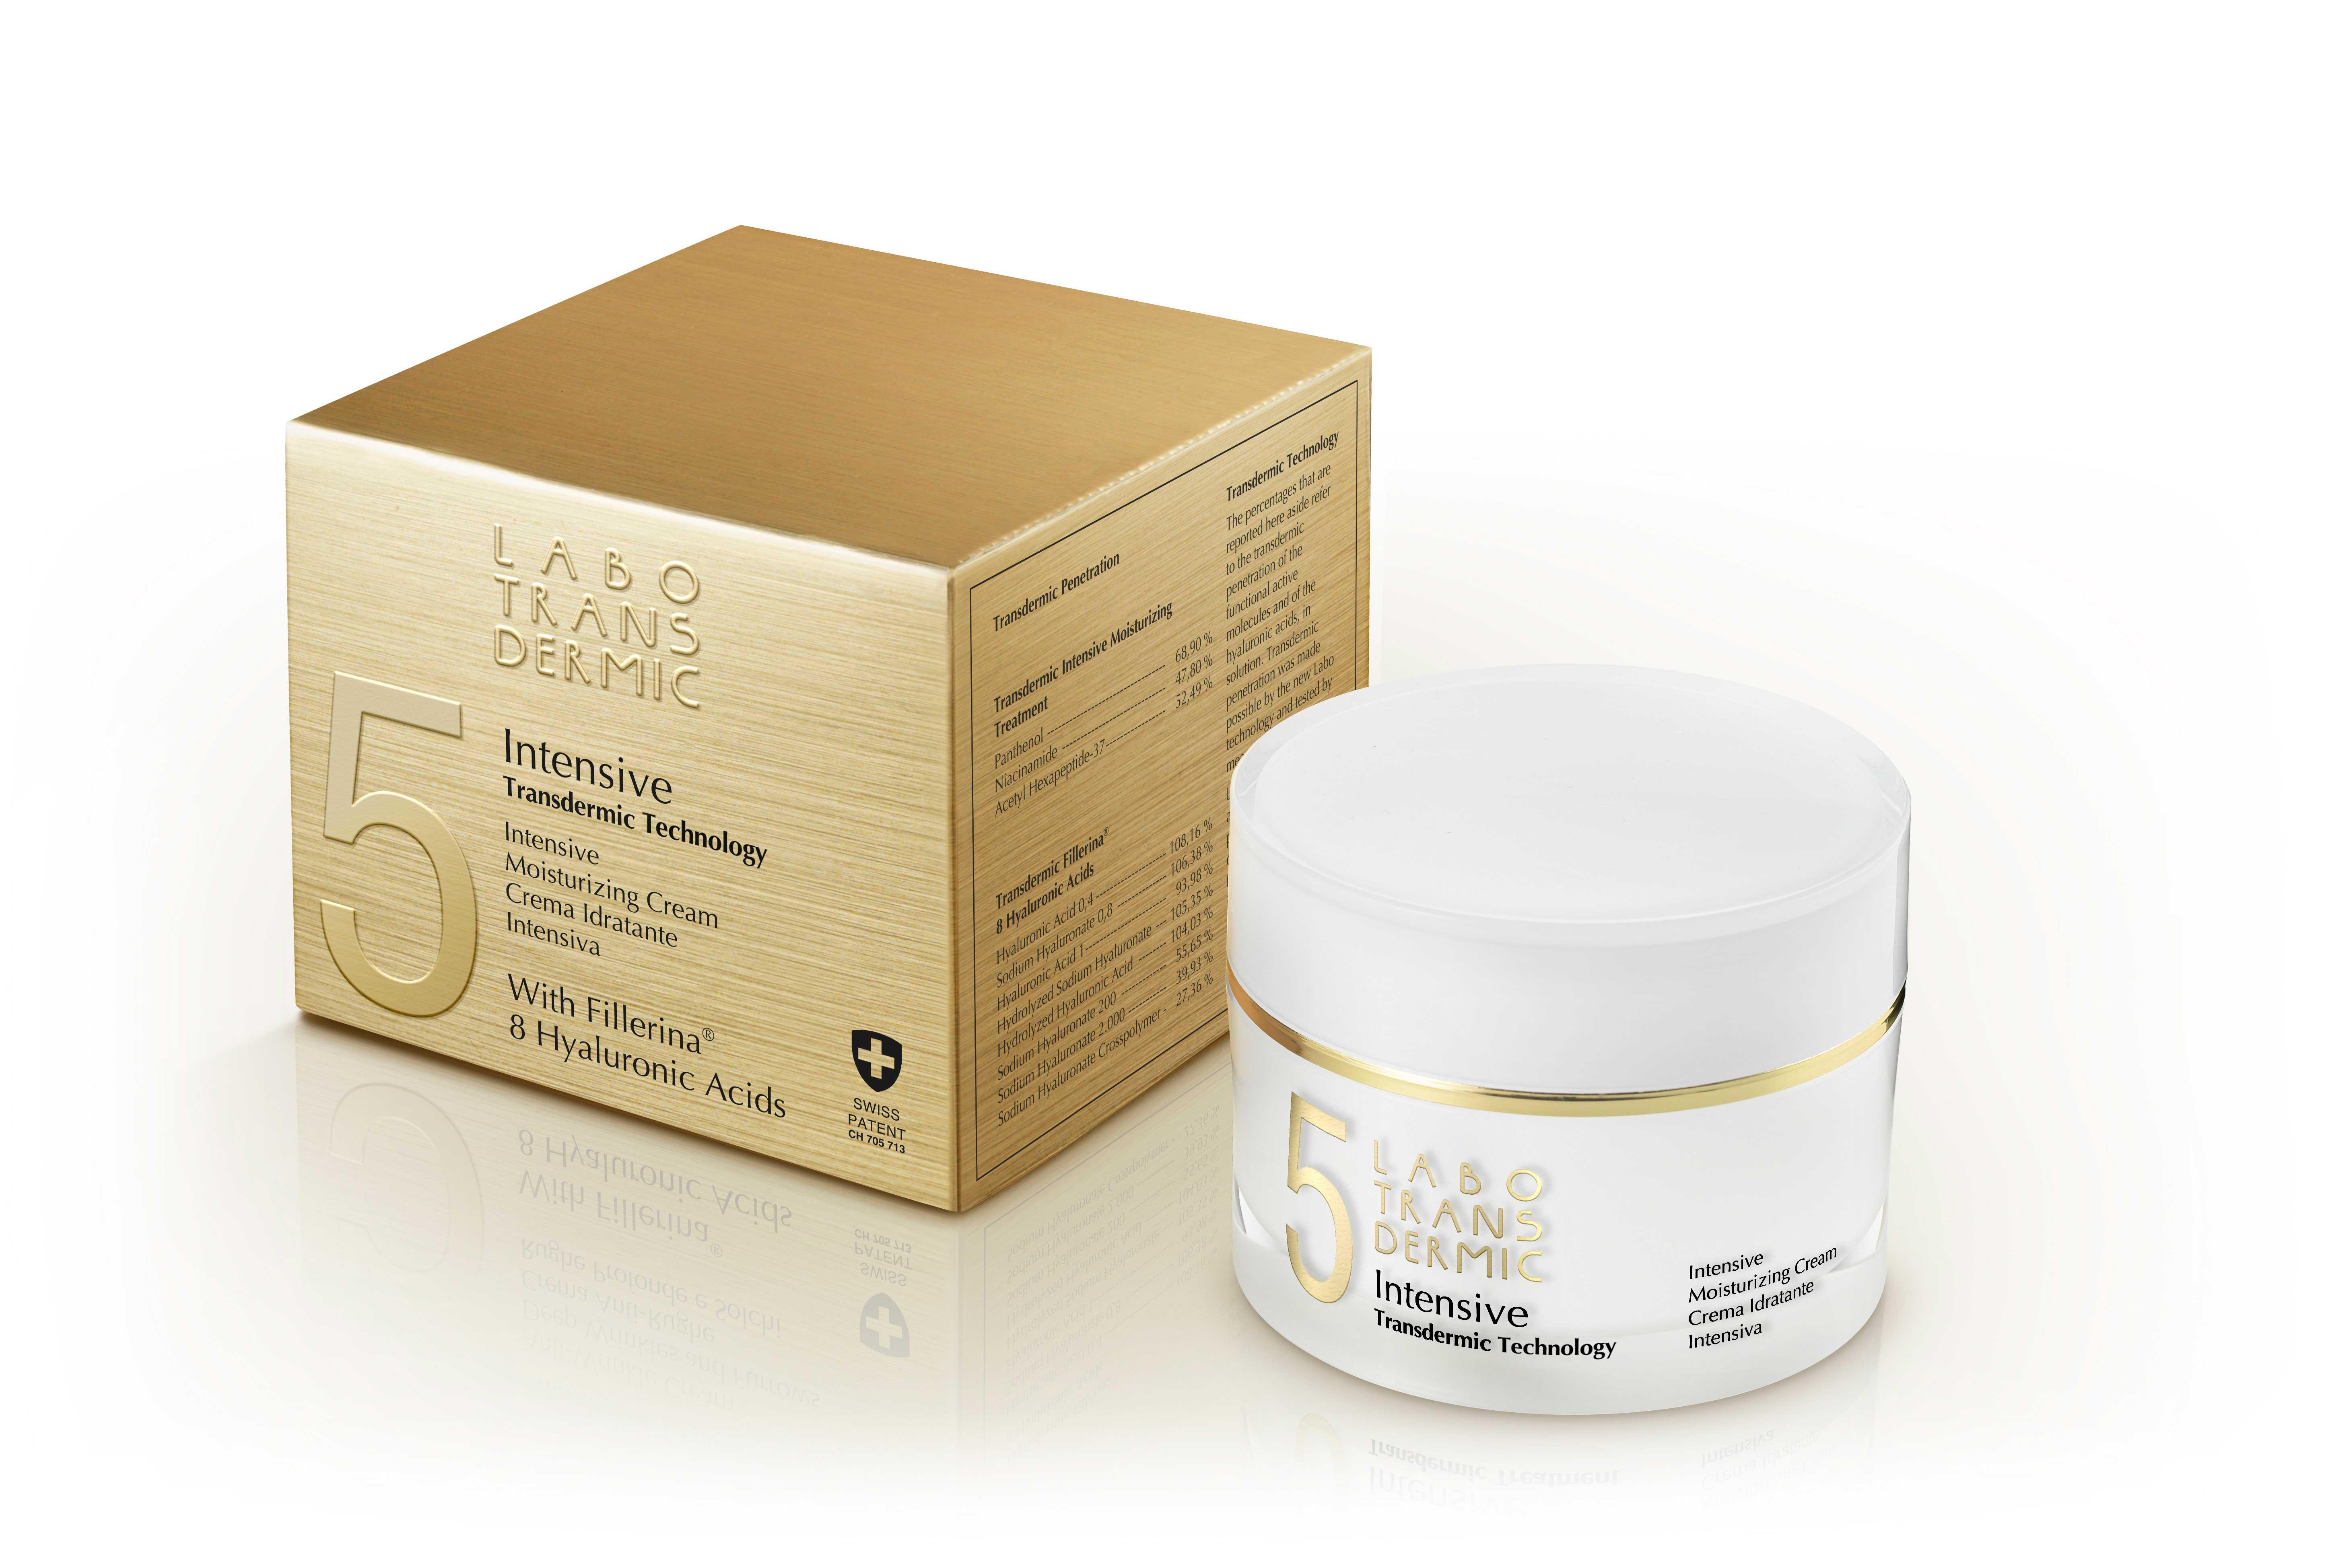 Transdermic Intensive Moisturizing cream